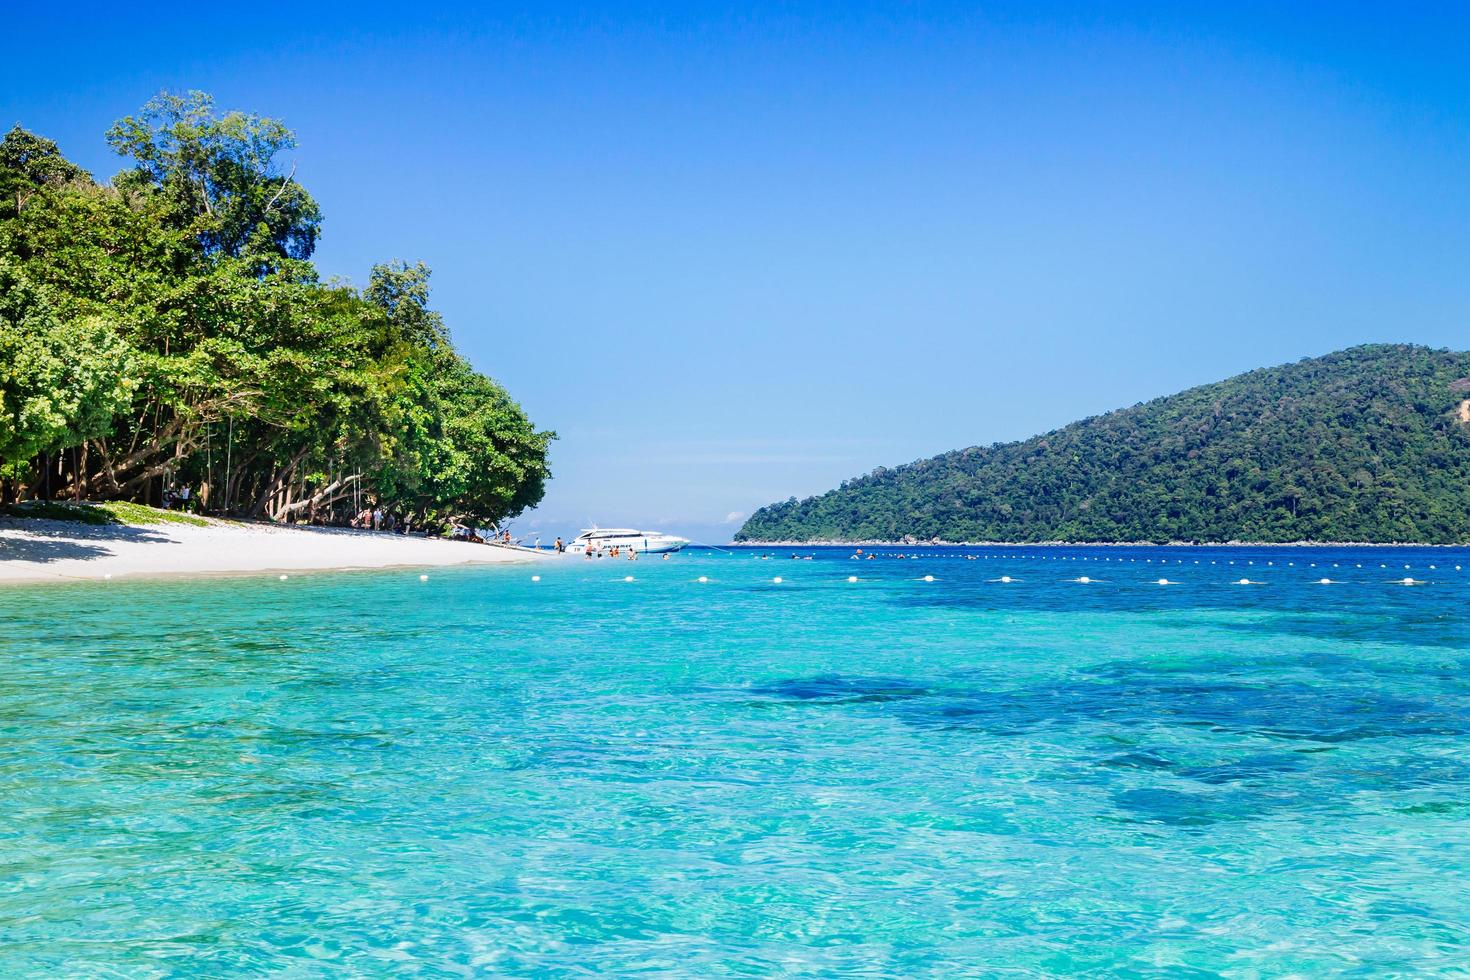 mooi zomers strand. lipe-eiland, koh lipe, satun-provincie thailand foto